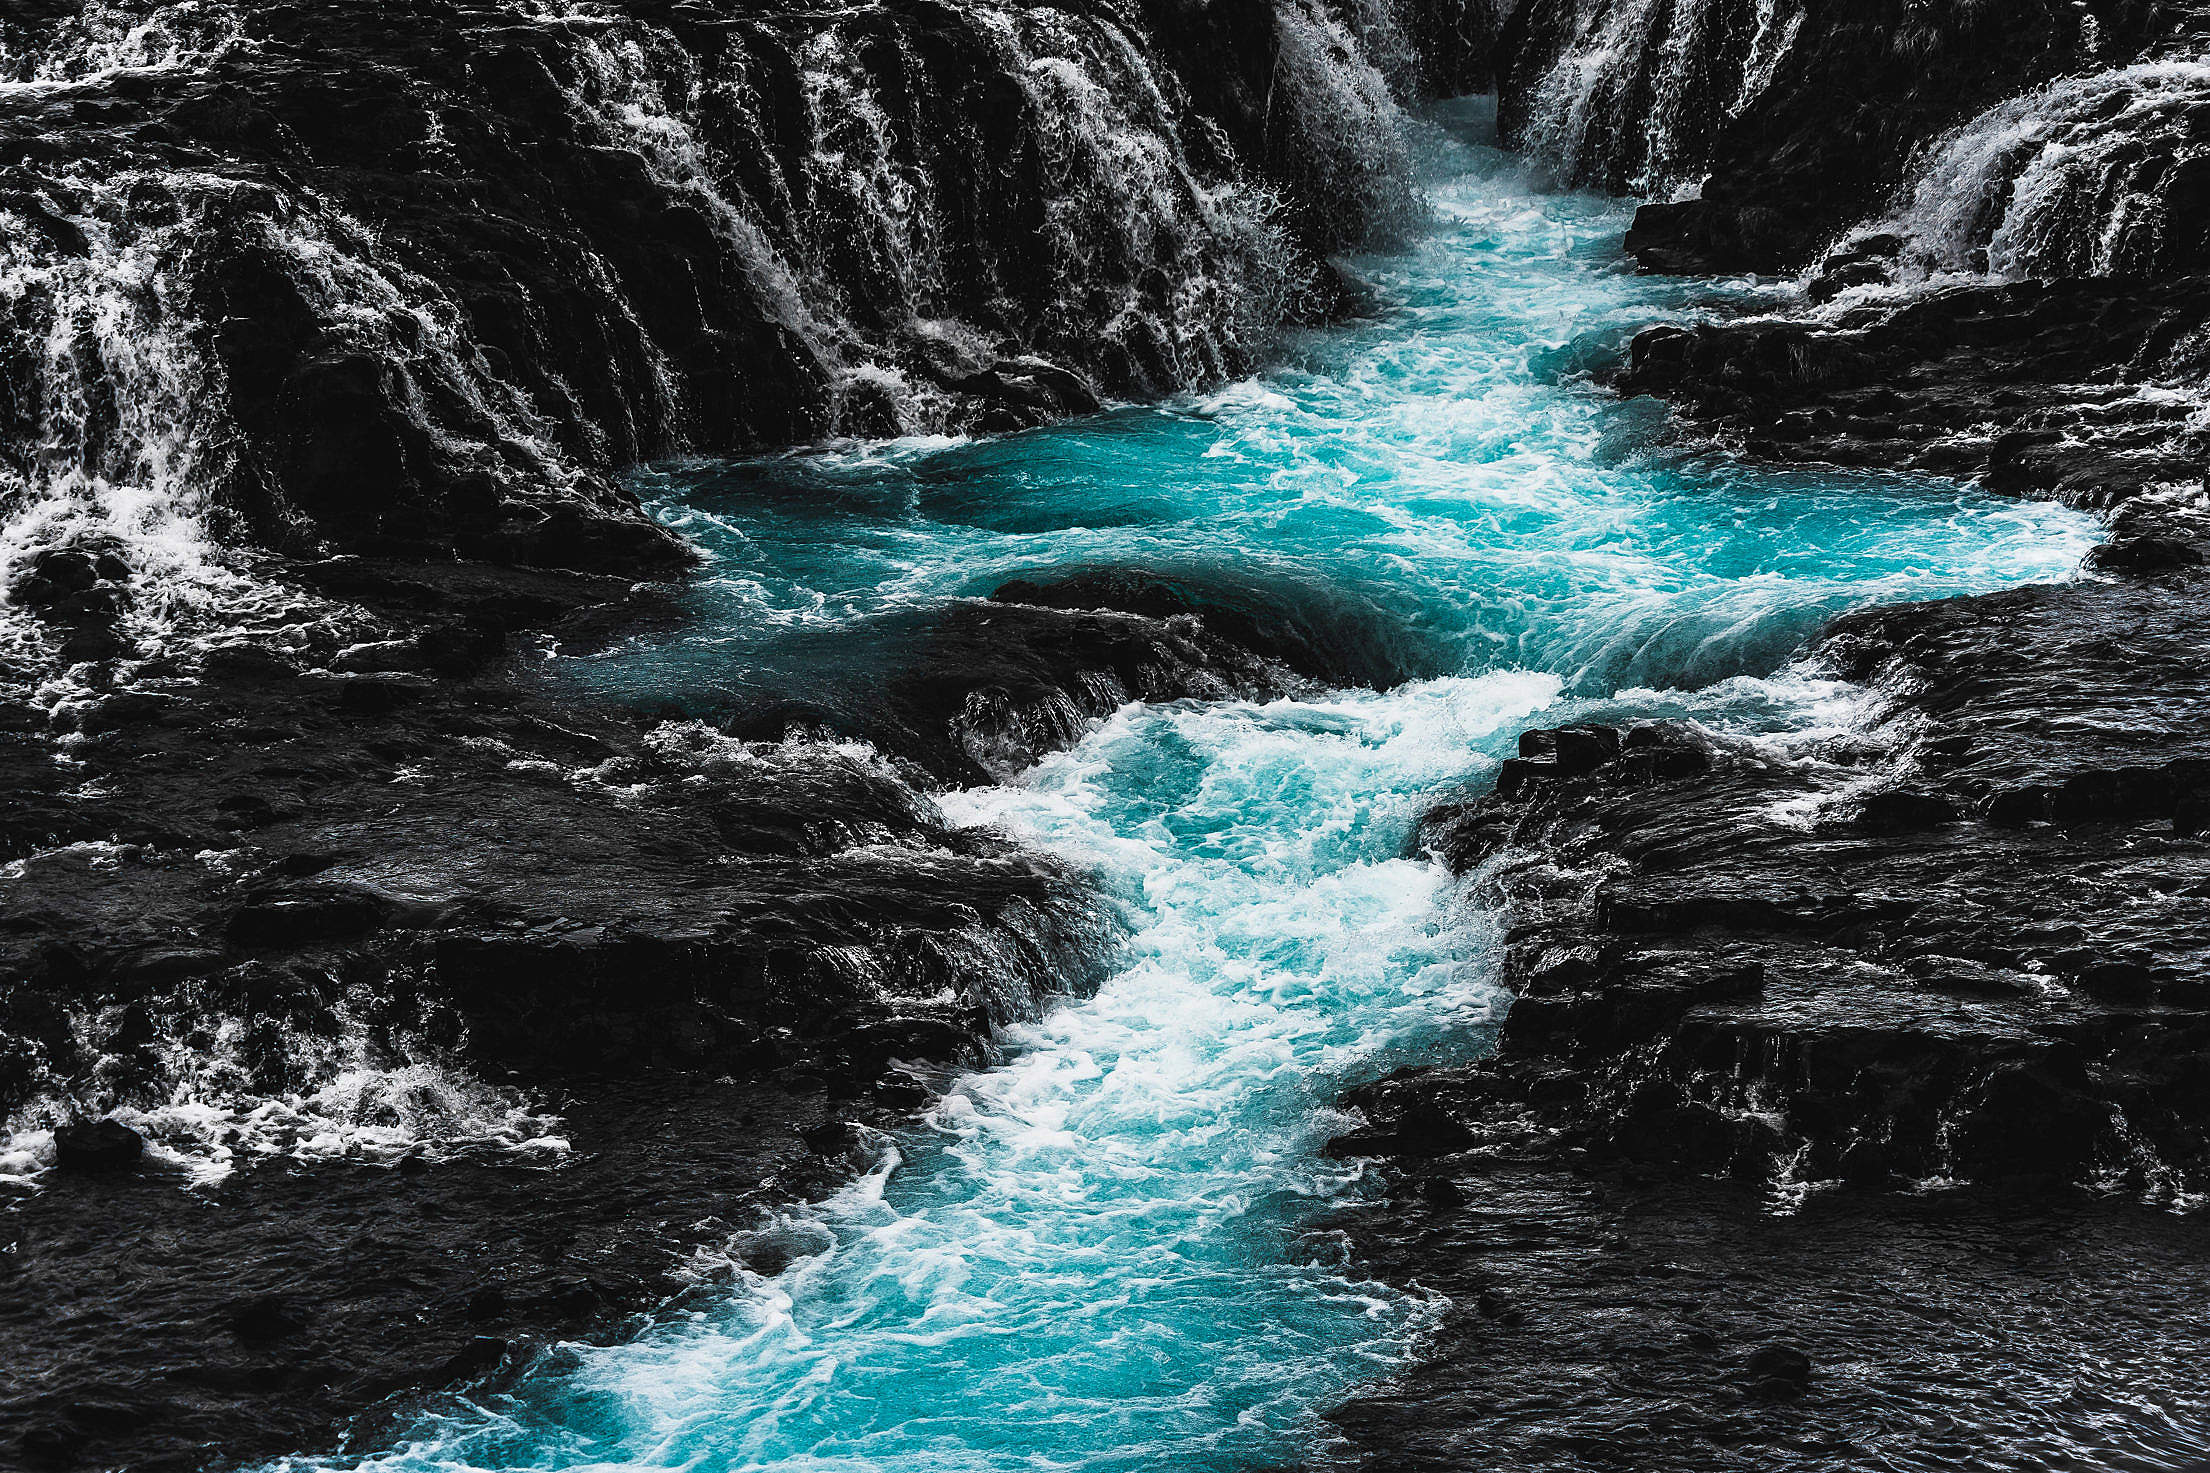 Bruarfoss Amazing Blue Waterfall in Iceland Free Stock Photo